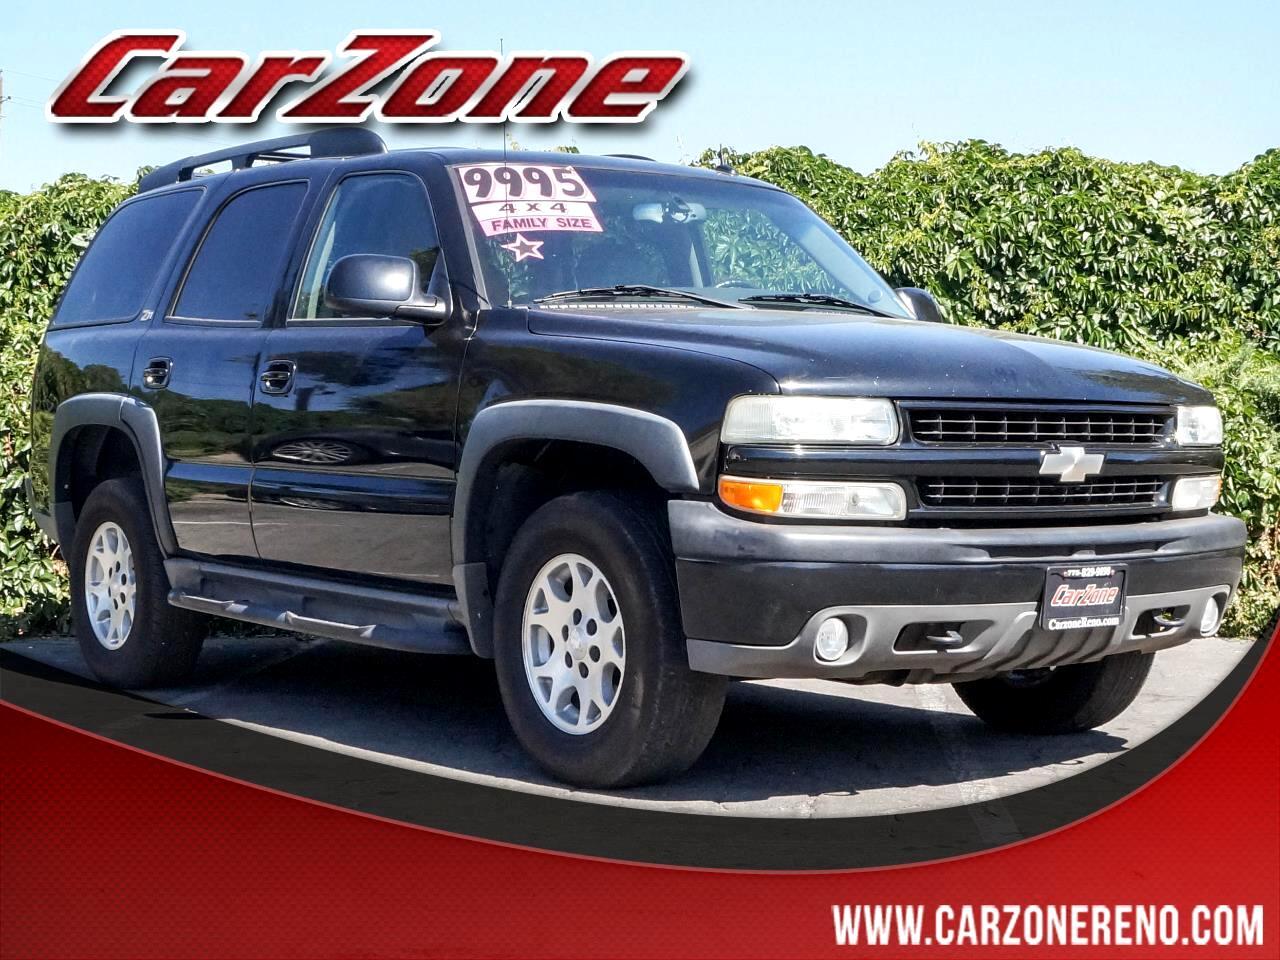 2004 Chevrolet Tahoe 4dr 1500 4WD Z71